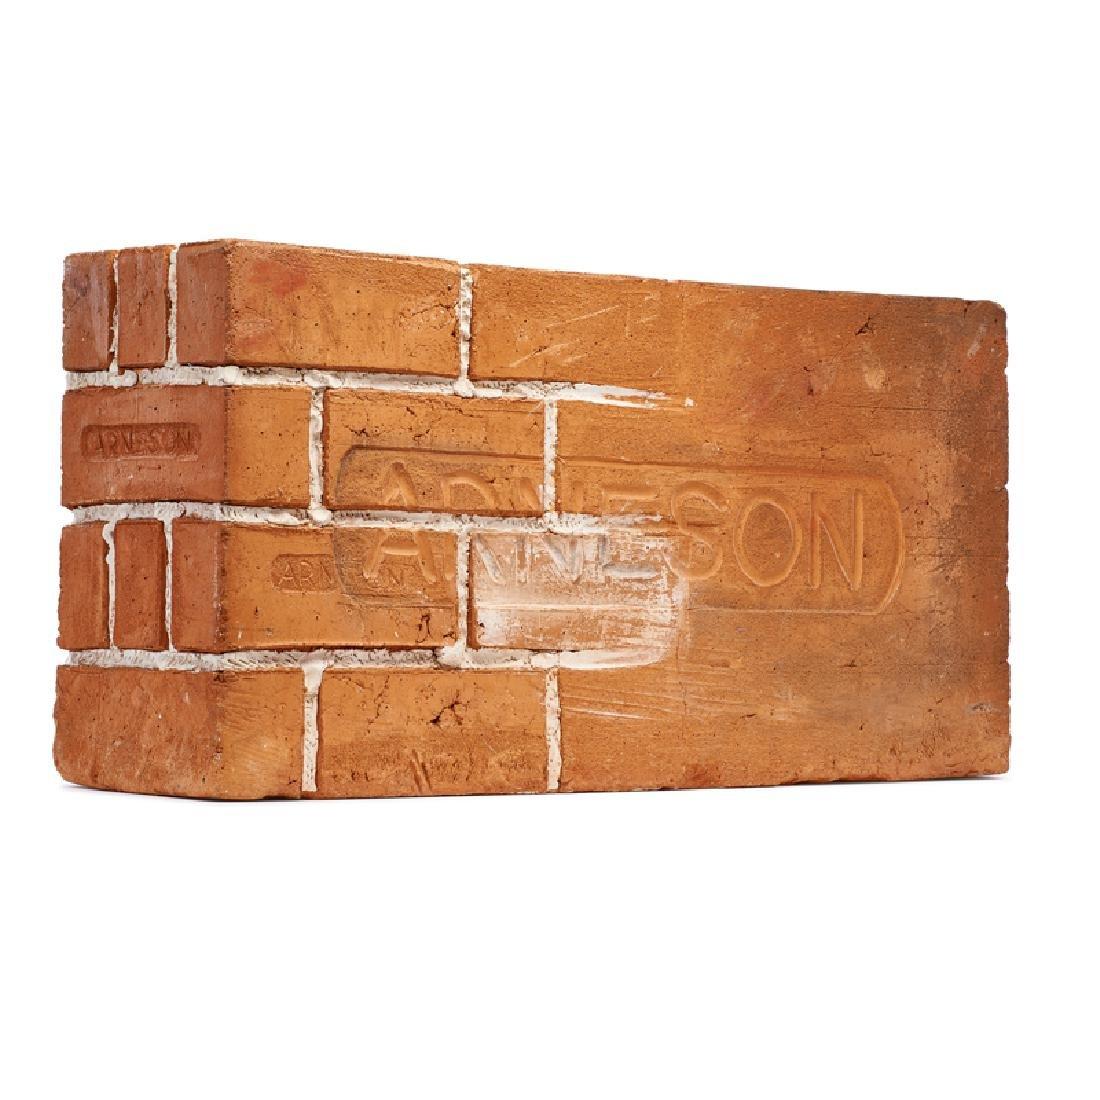 ROBERT ARNESON Massive brick sculpture